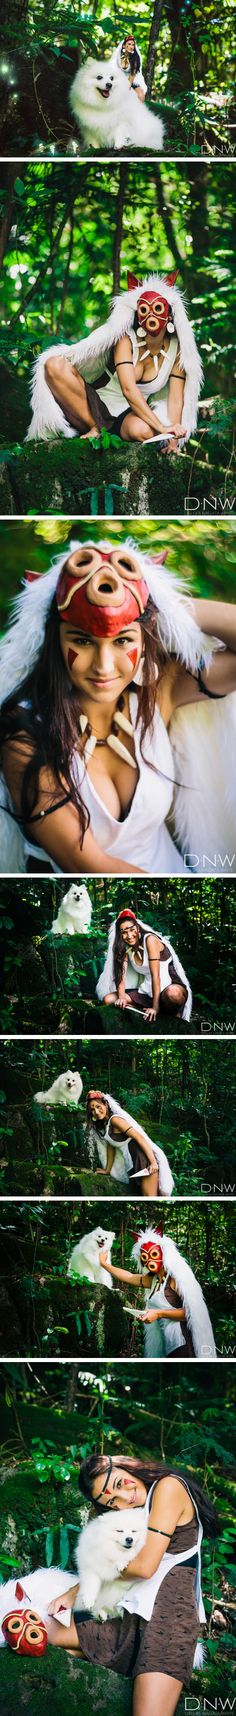 Hawaiian Photographer's Princess Mononoke Cosplay Has A Cute Twist